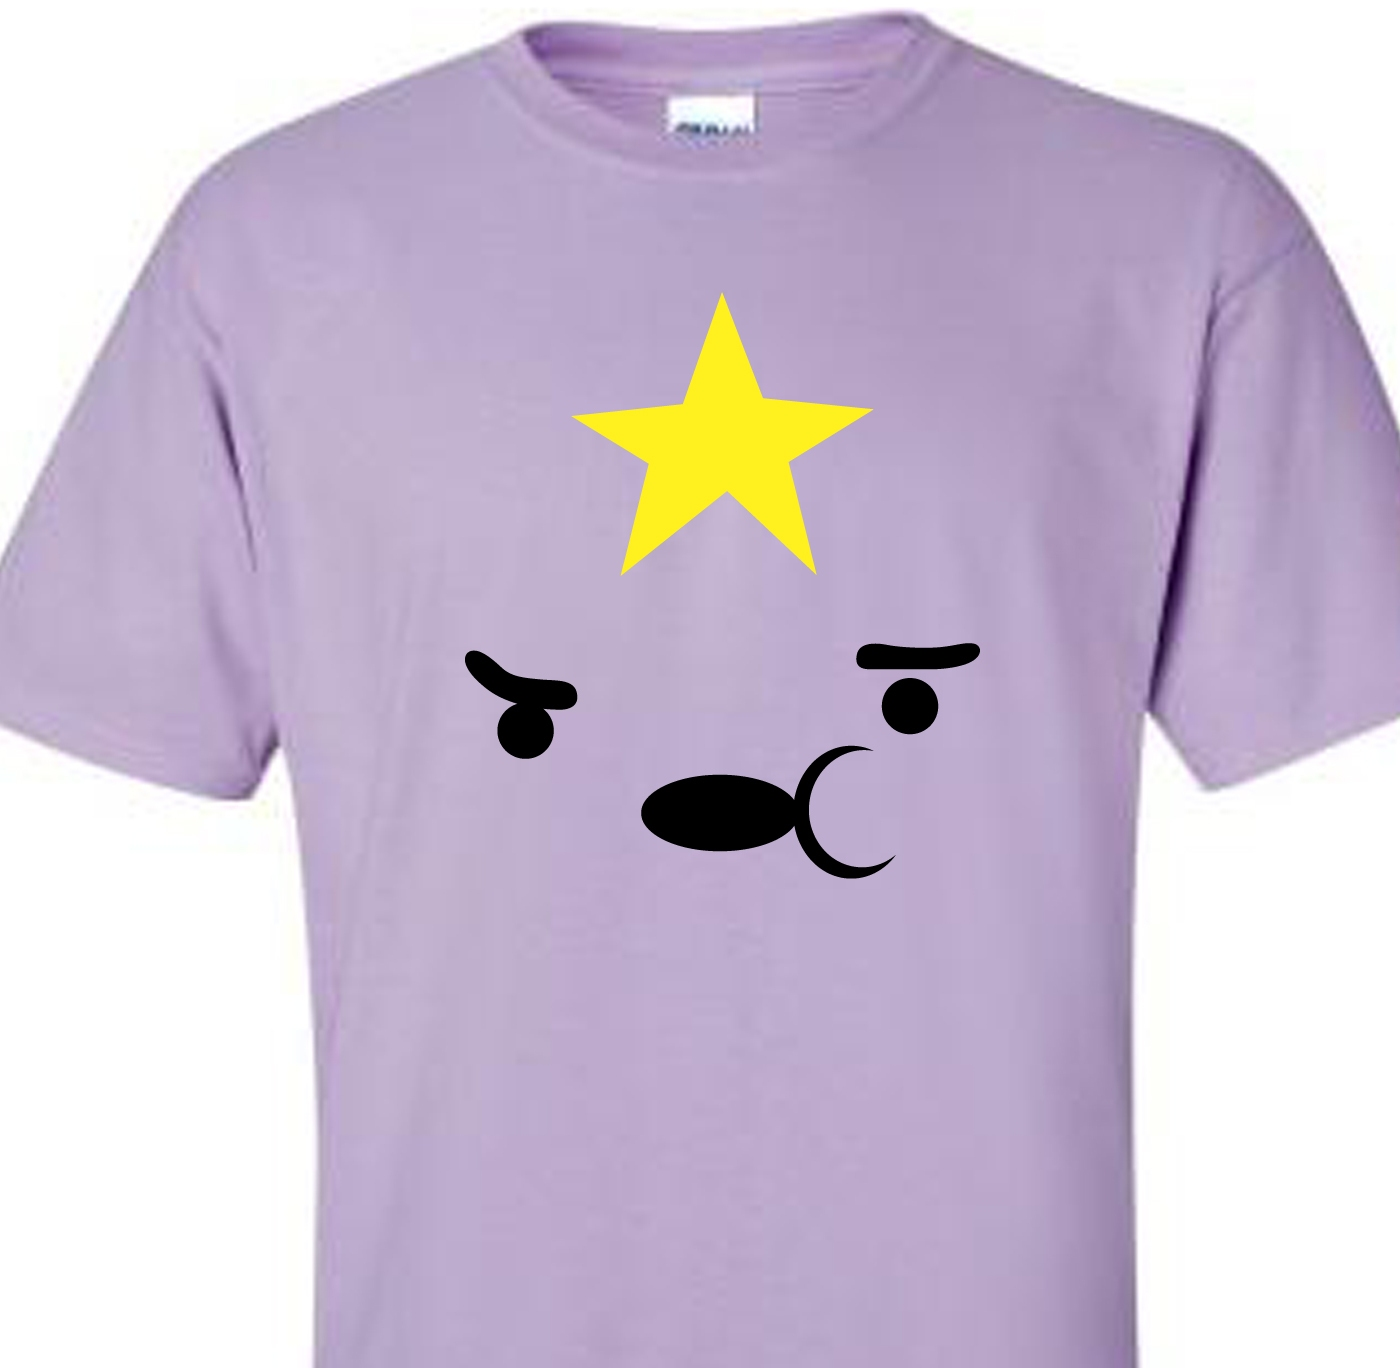 Lumpy Princess T Shirt Adventure Time Jake For Men/Women